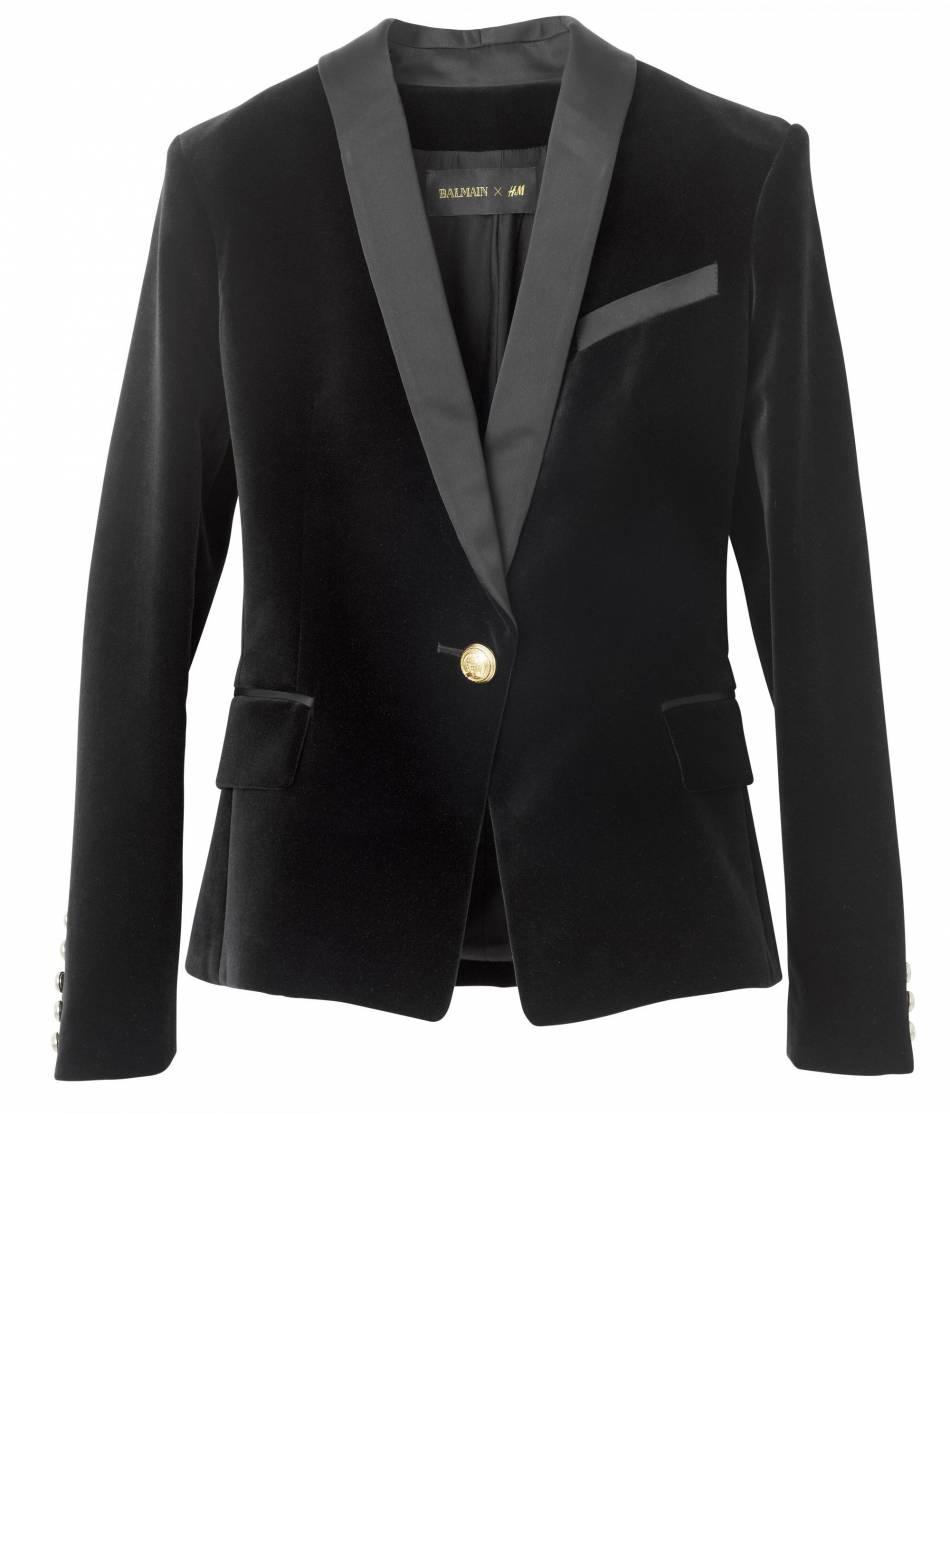 Balmain x H&M - veste